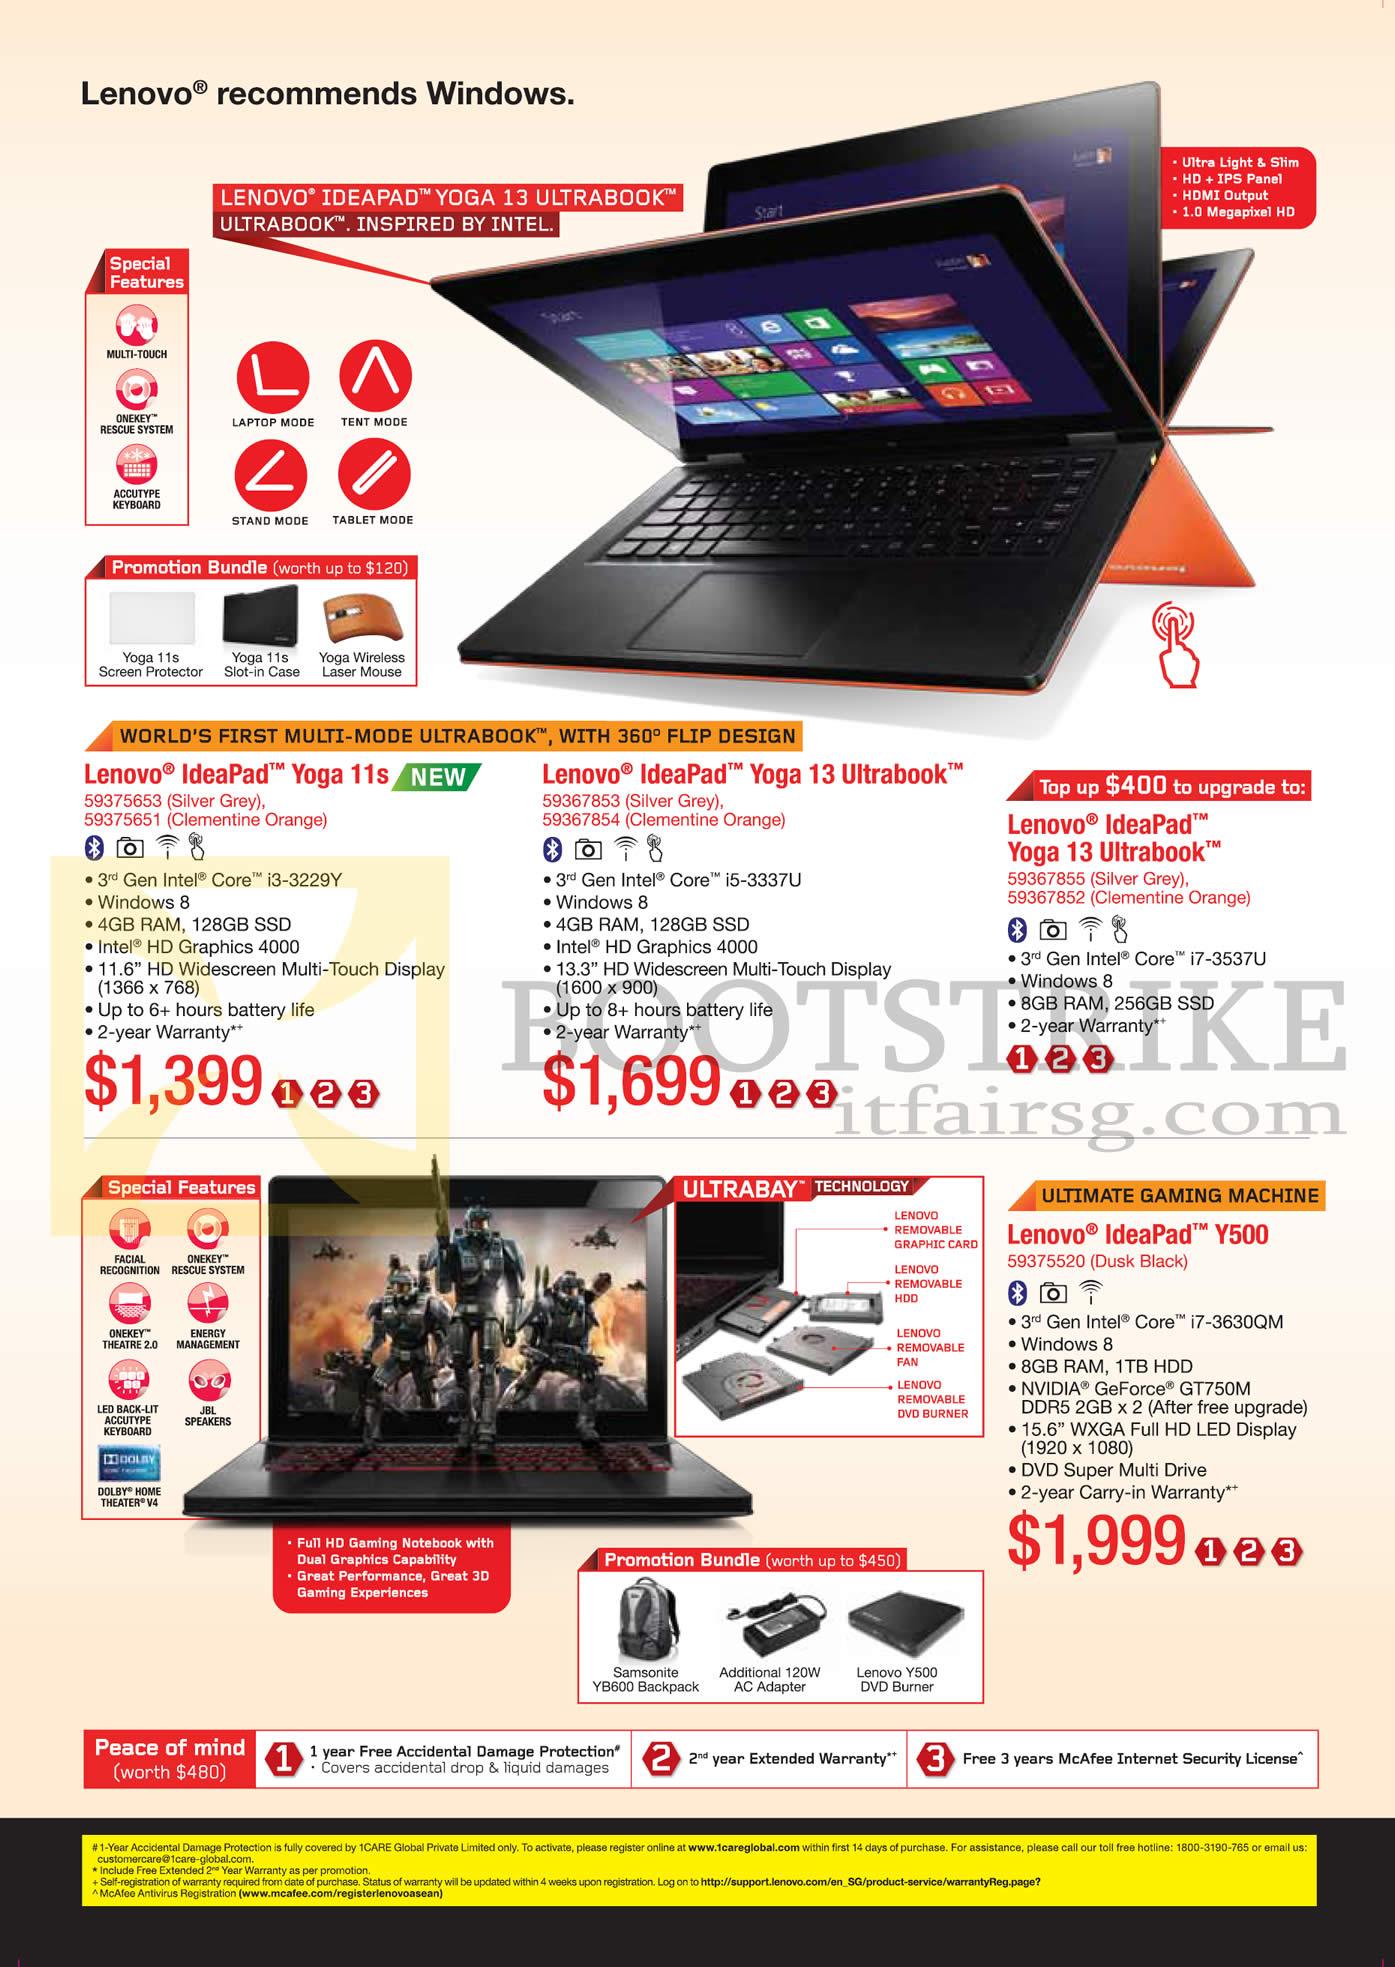 PC SHOW 2013 price list image brochure of Lenovo Notebooks Ideapad Yoga 11s, Yoga 13, Yoga Y500